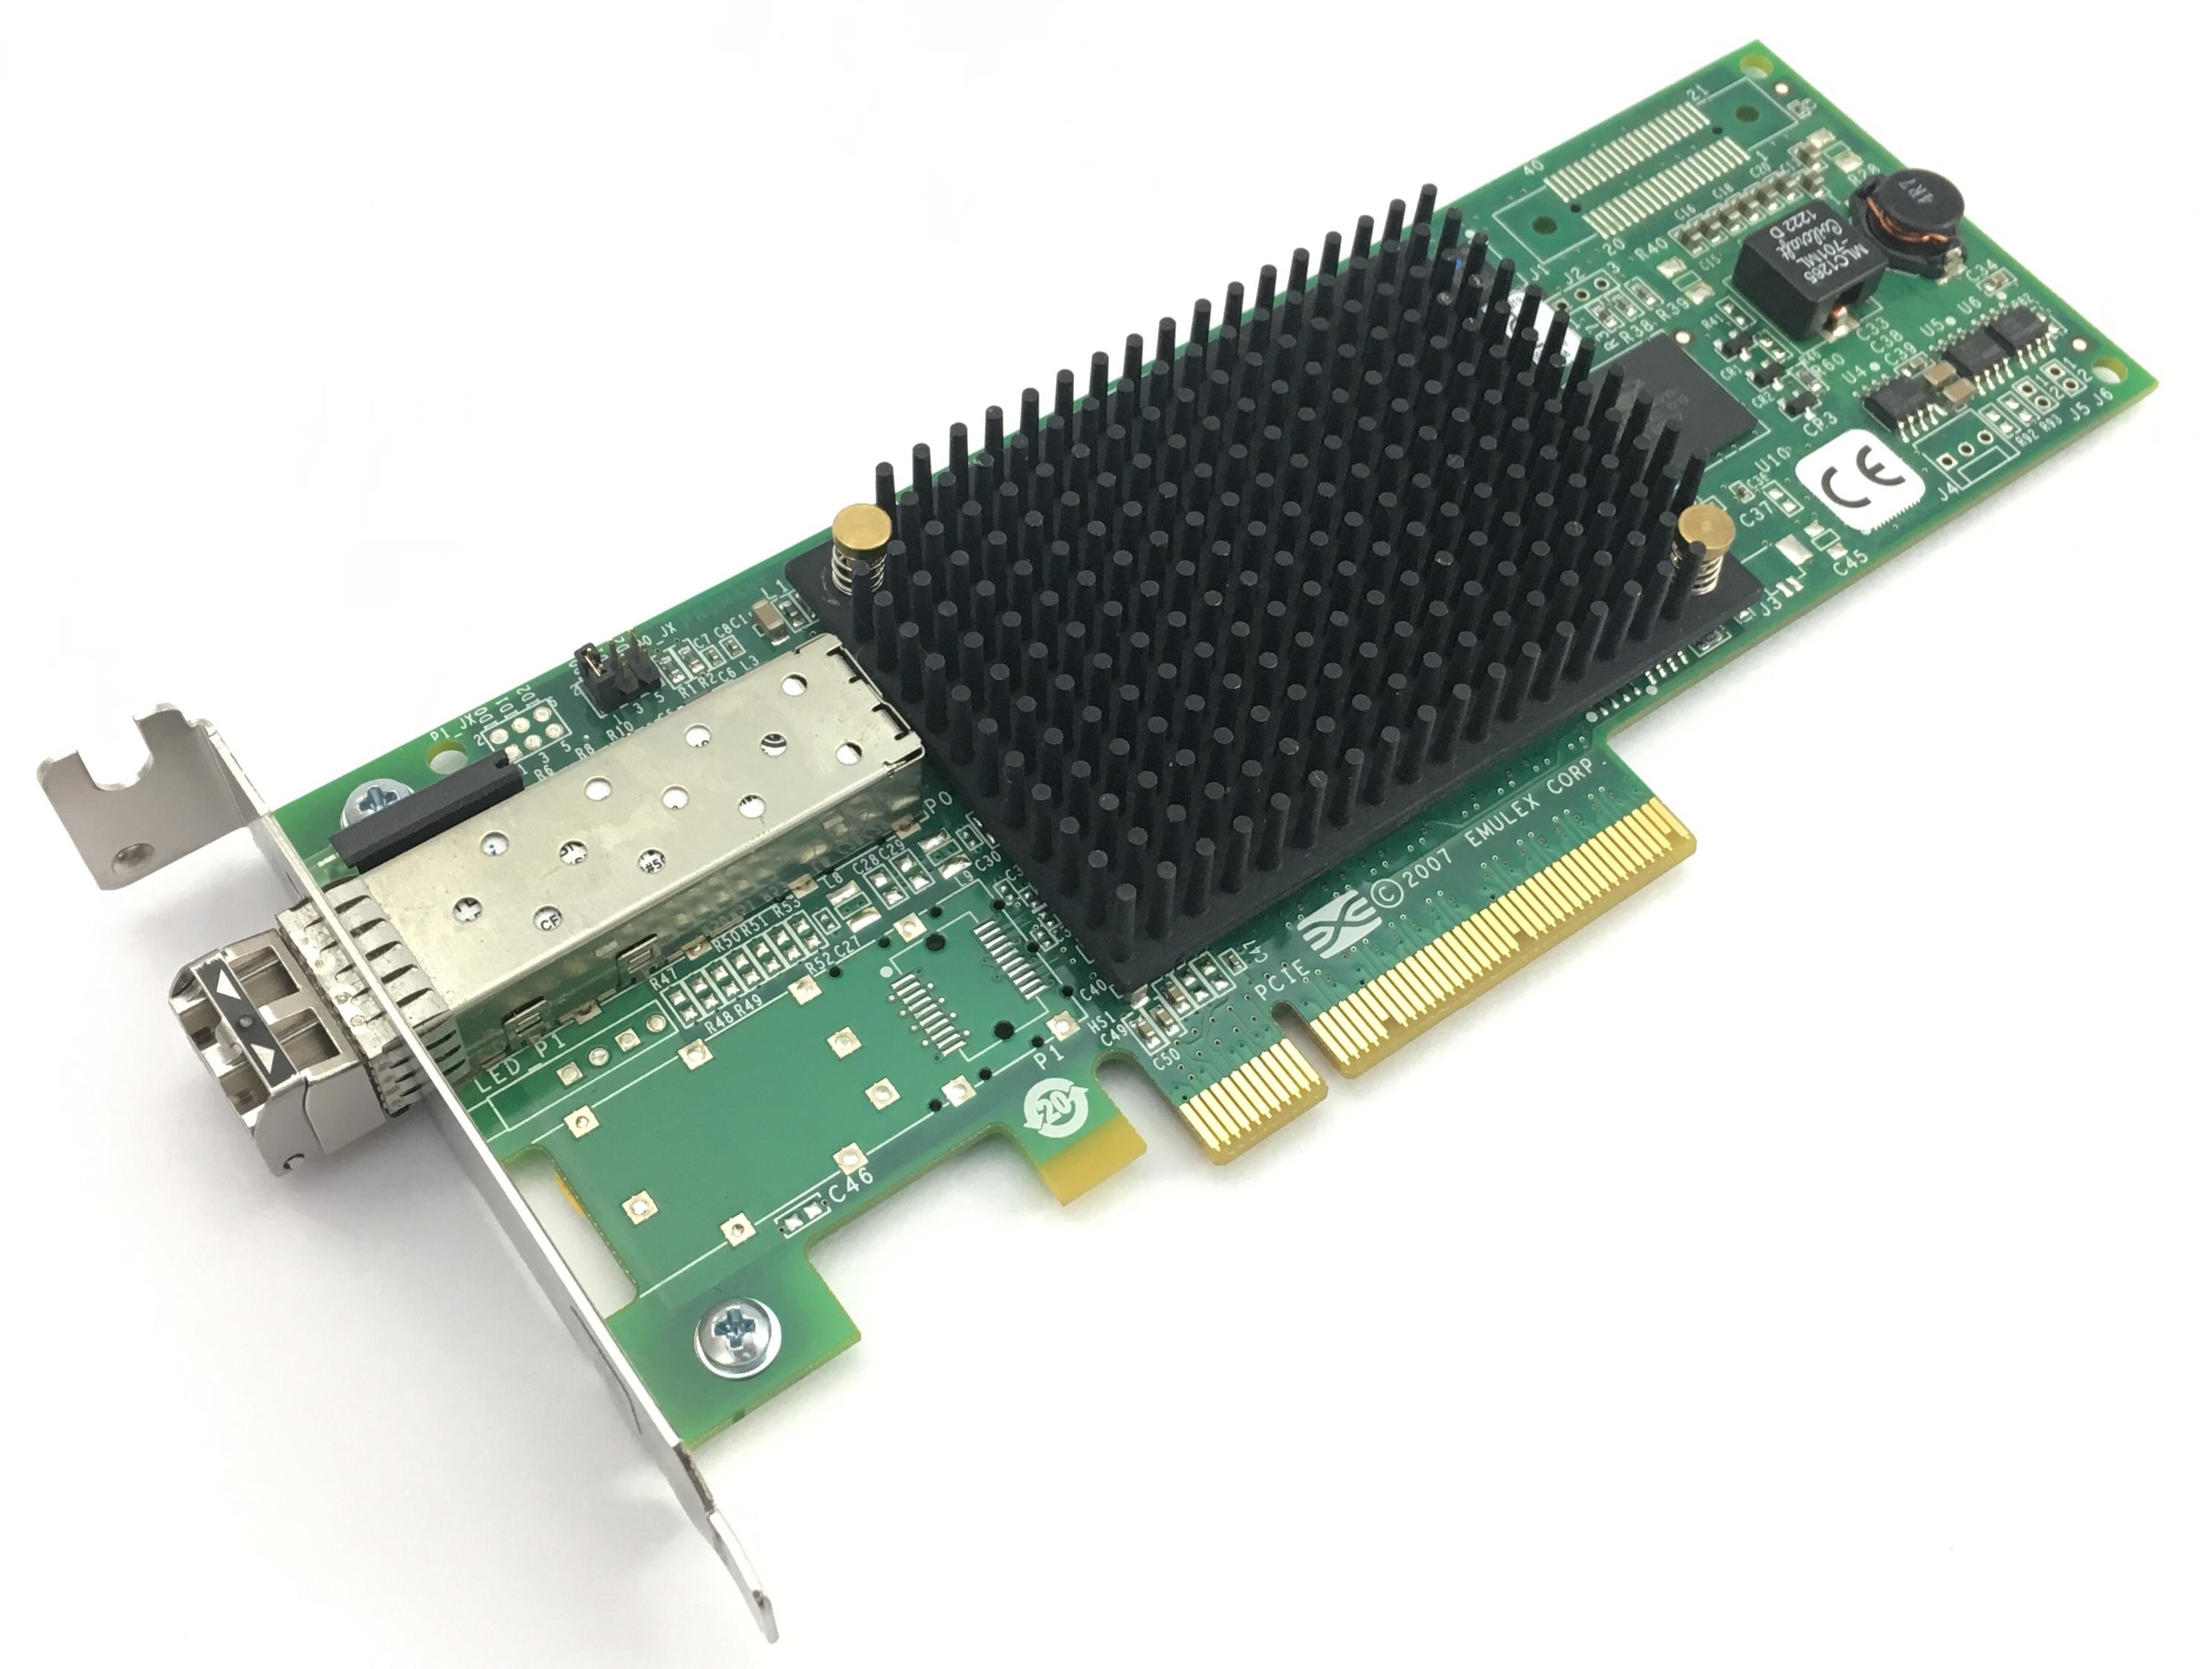 Broadcom 8Gfc Single Port FC HBA (LPE12000)